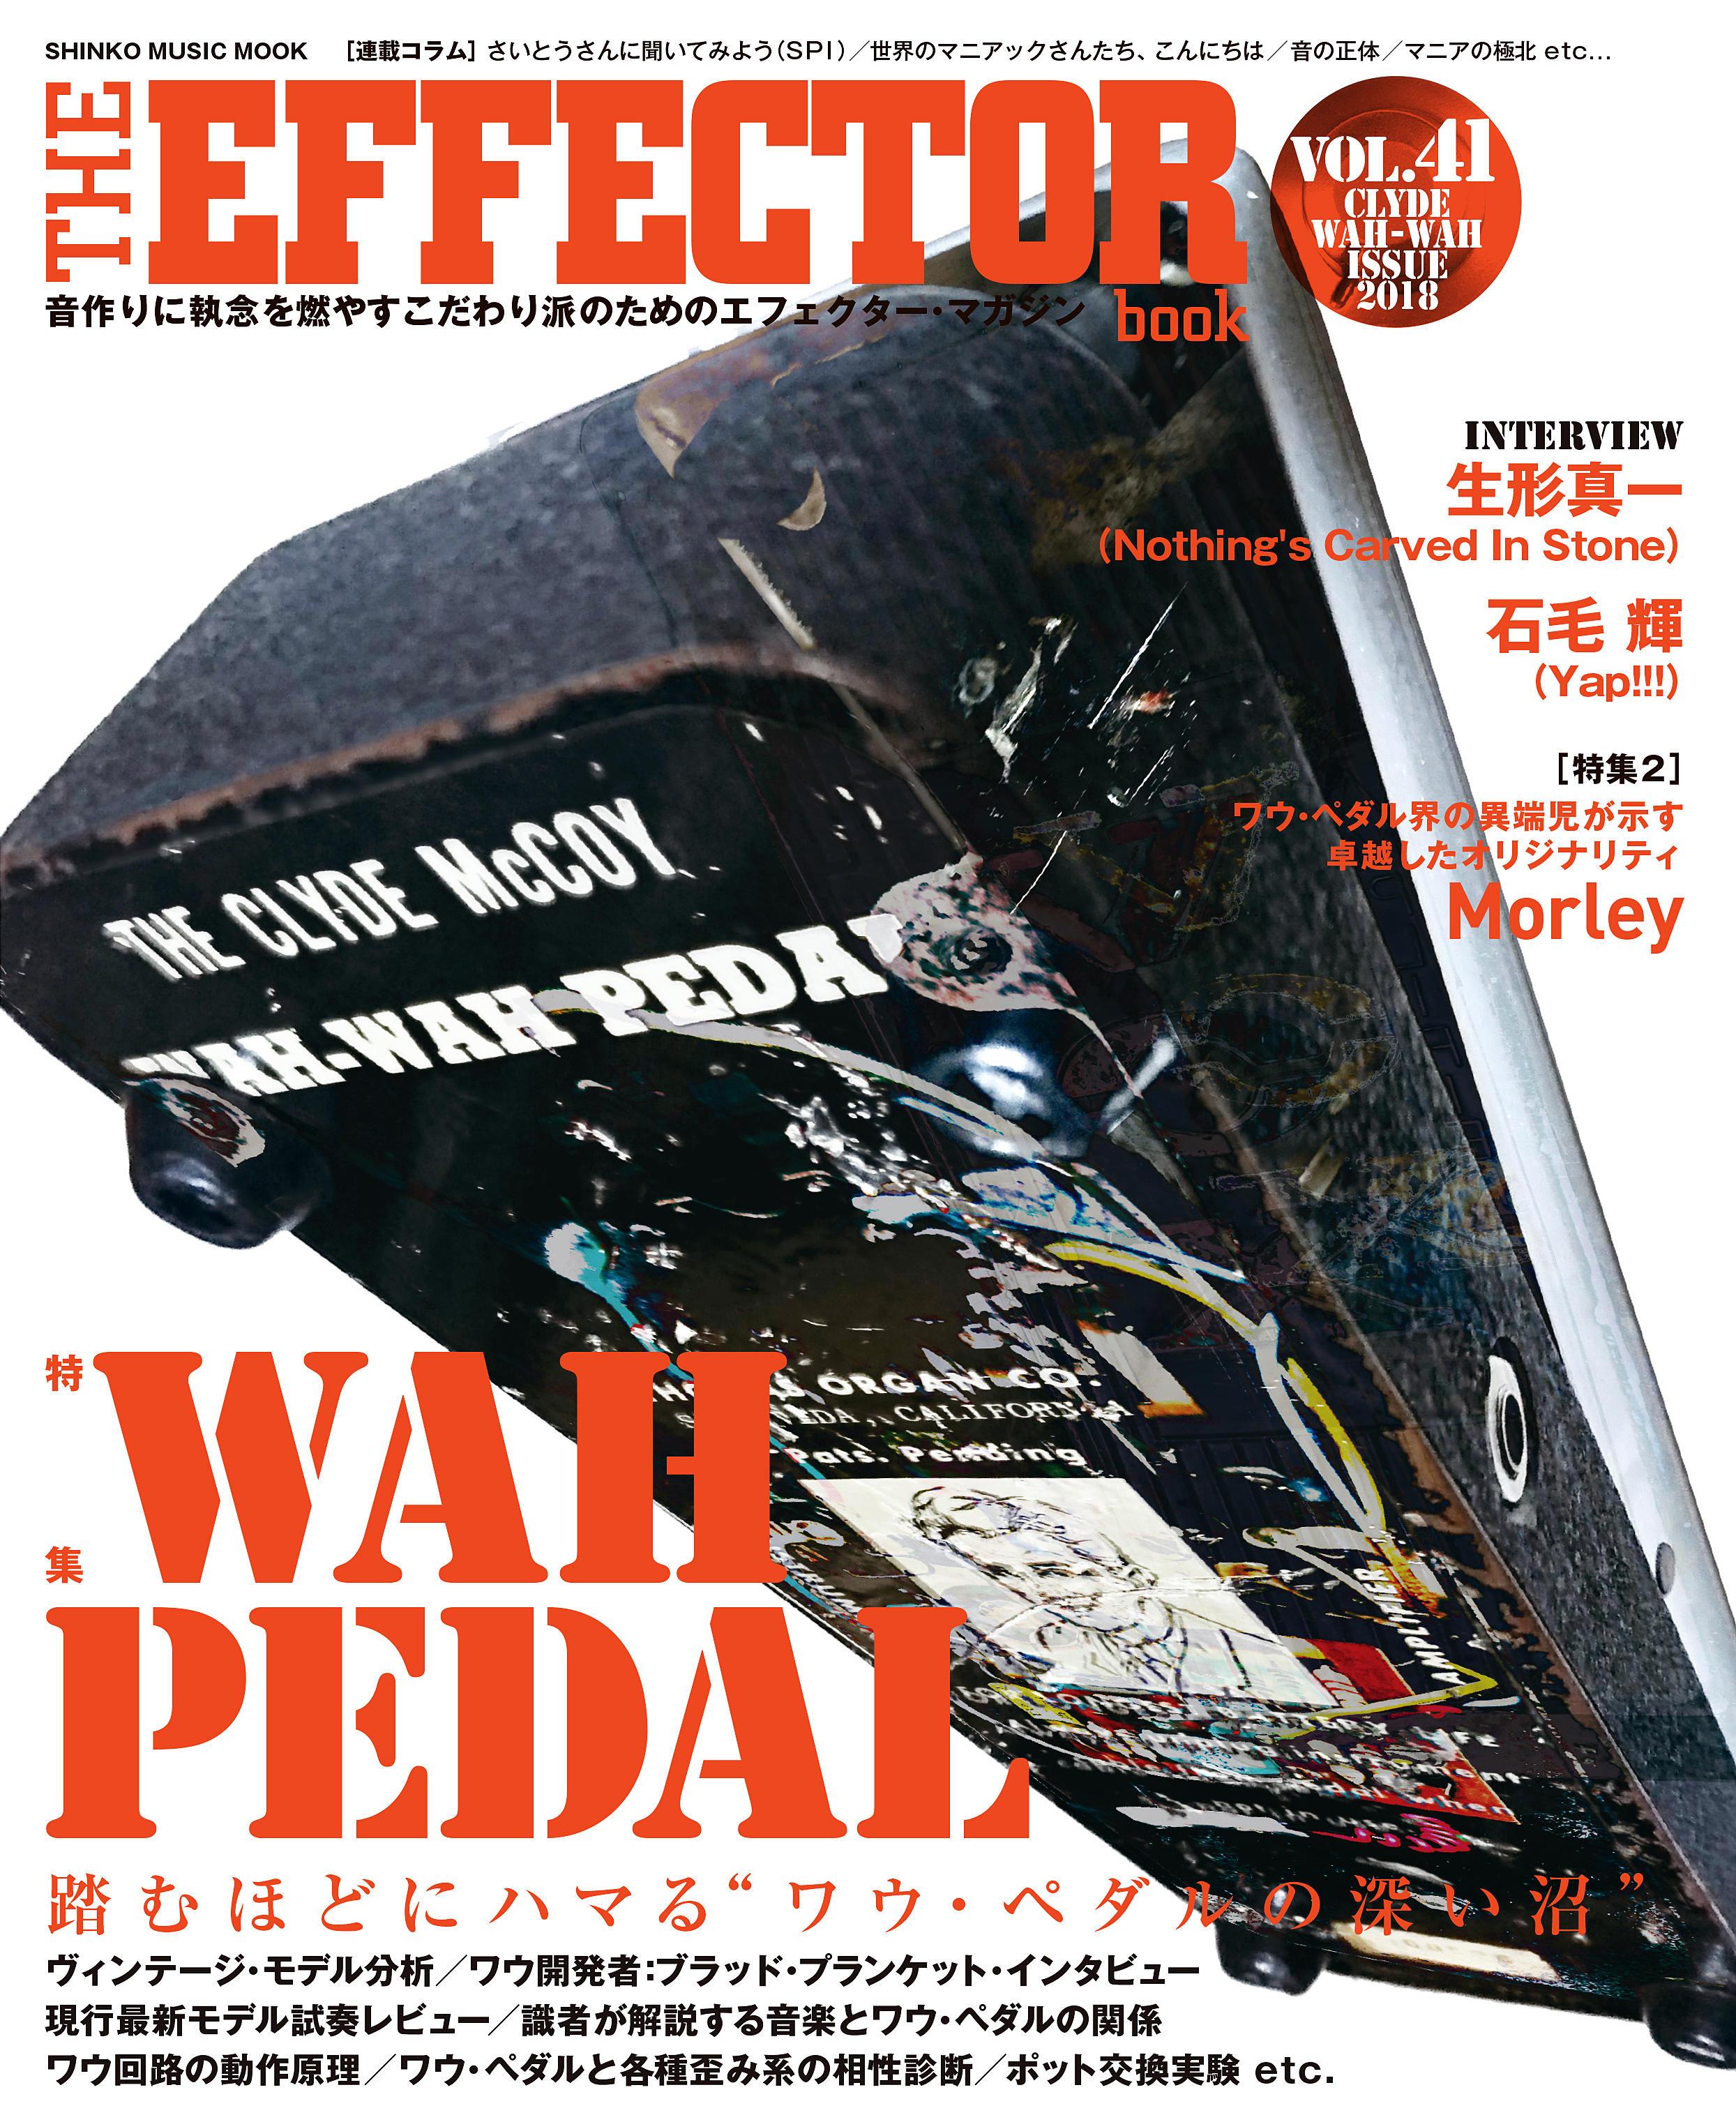 EB41_Cover.jpg